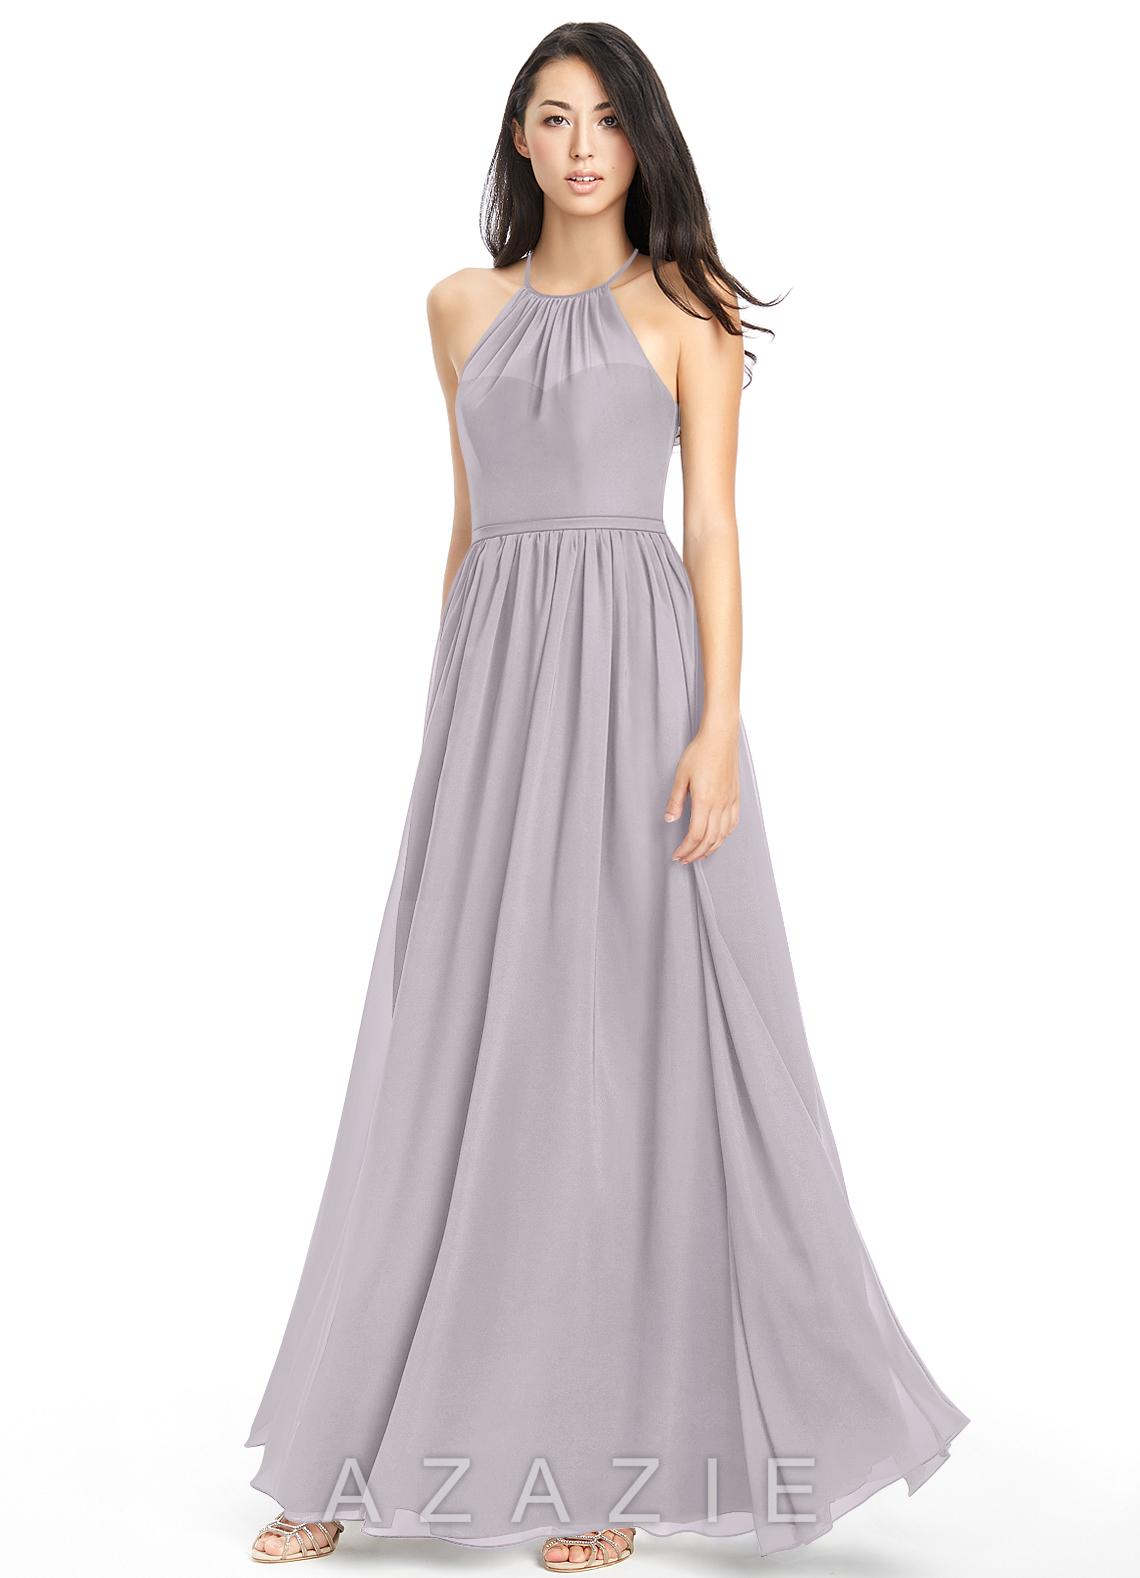 Azazie kailyn bridesmaid dress azazie loading zoom ombrellifo Images